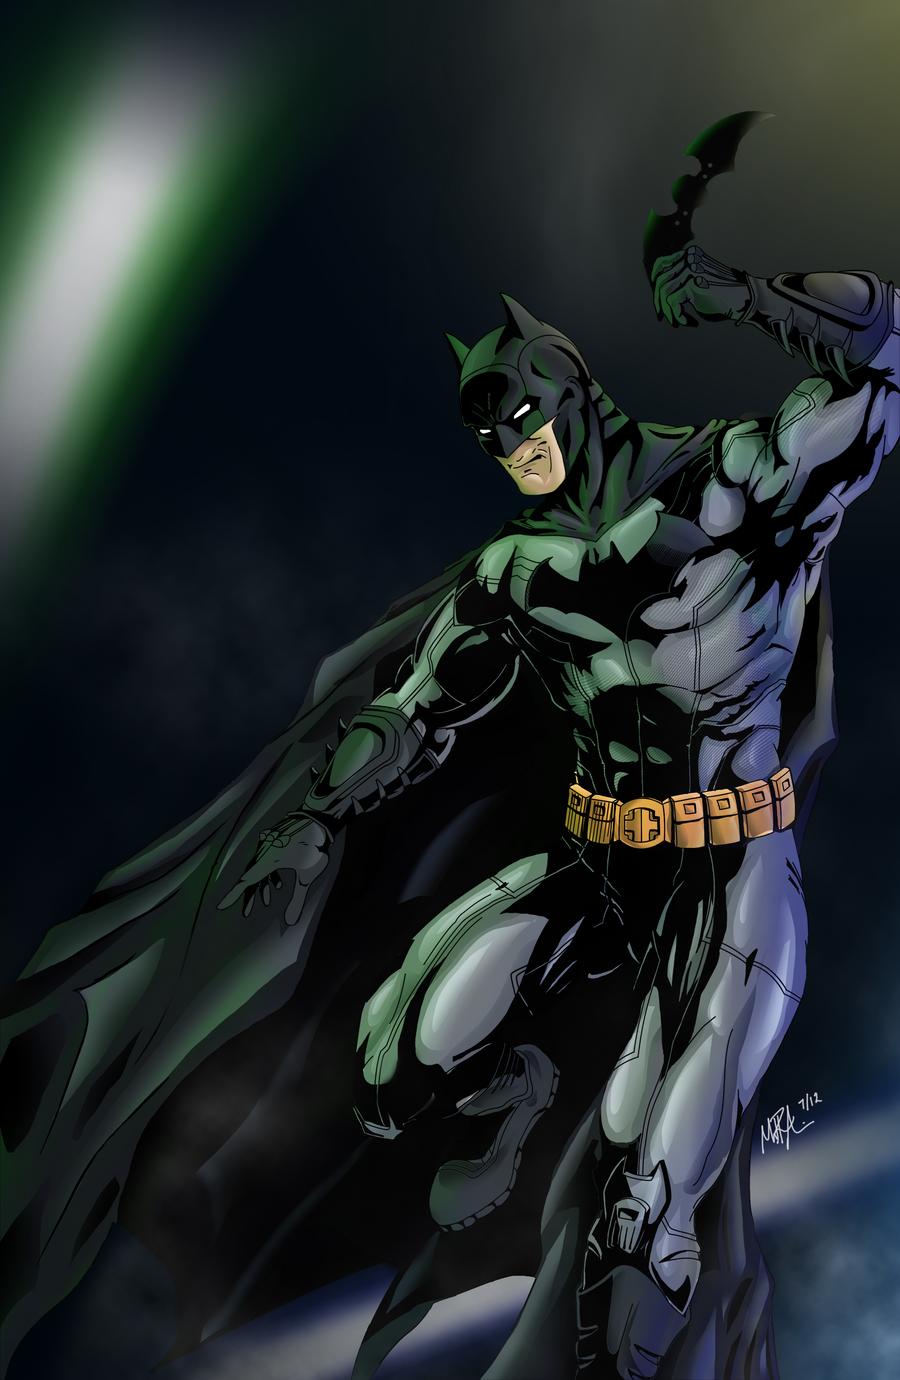 Batman - New 52 by Vail-Akatosh on DeviantArt